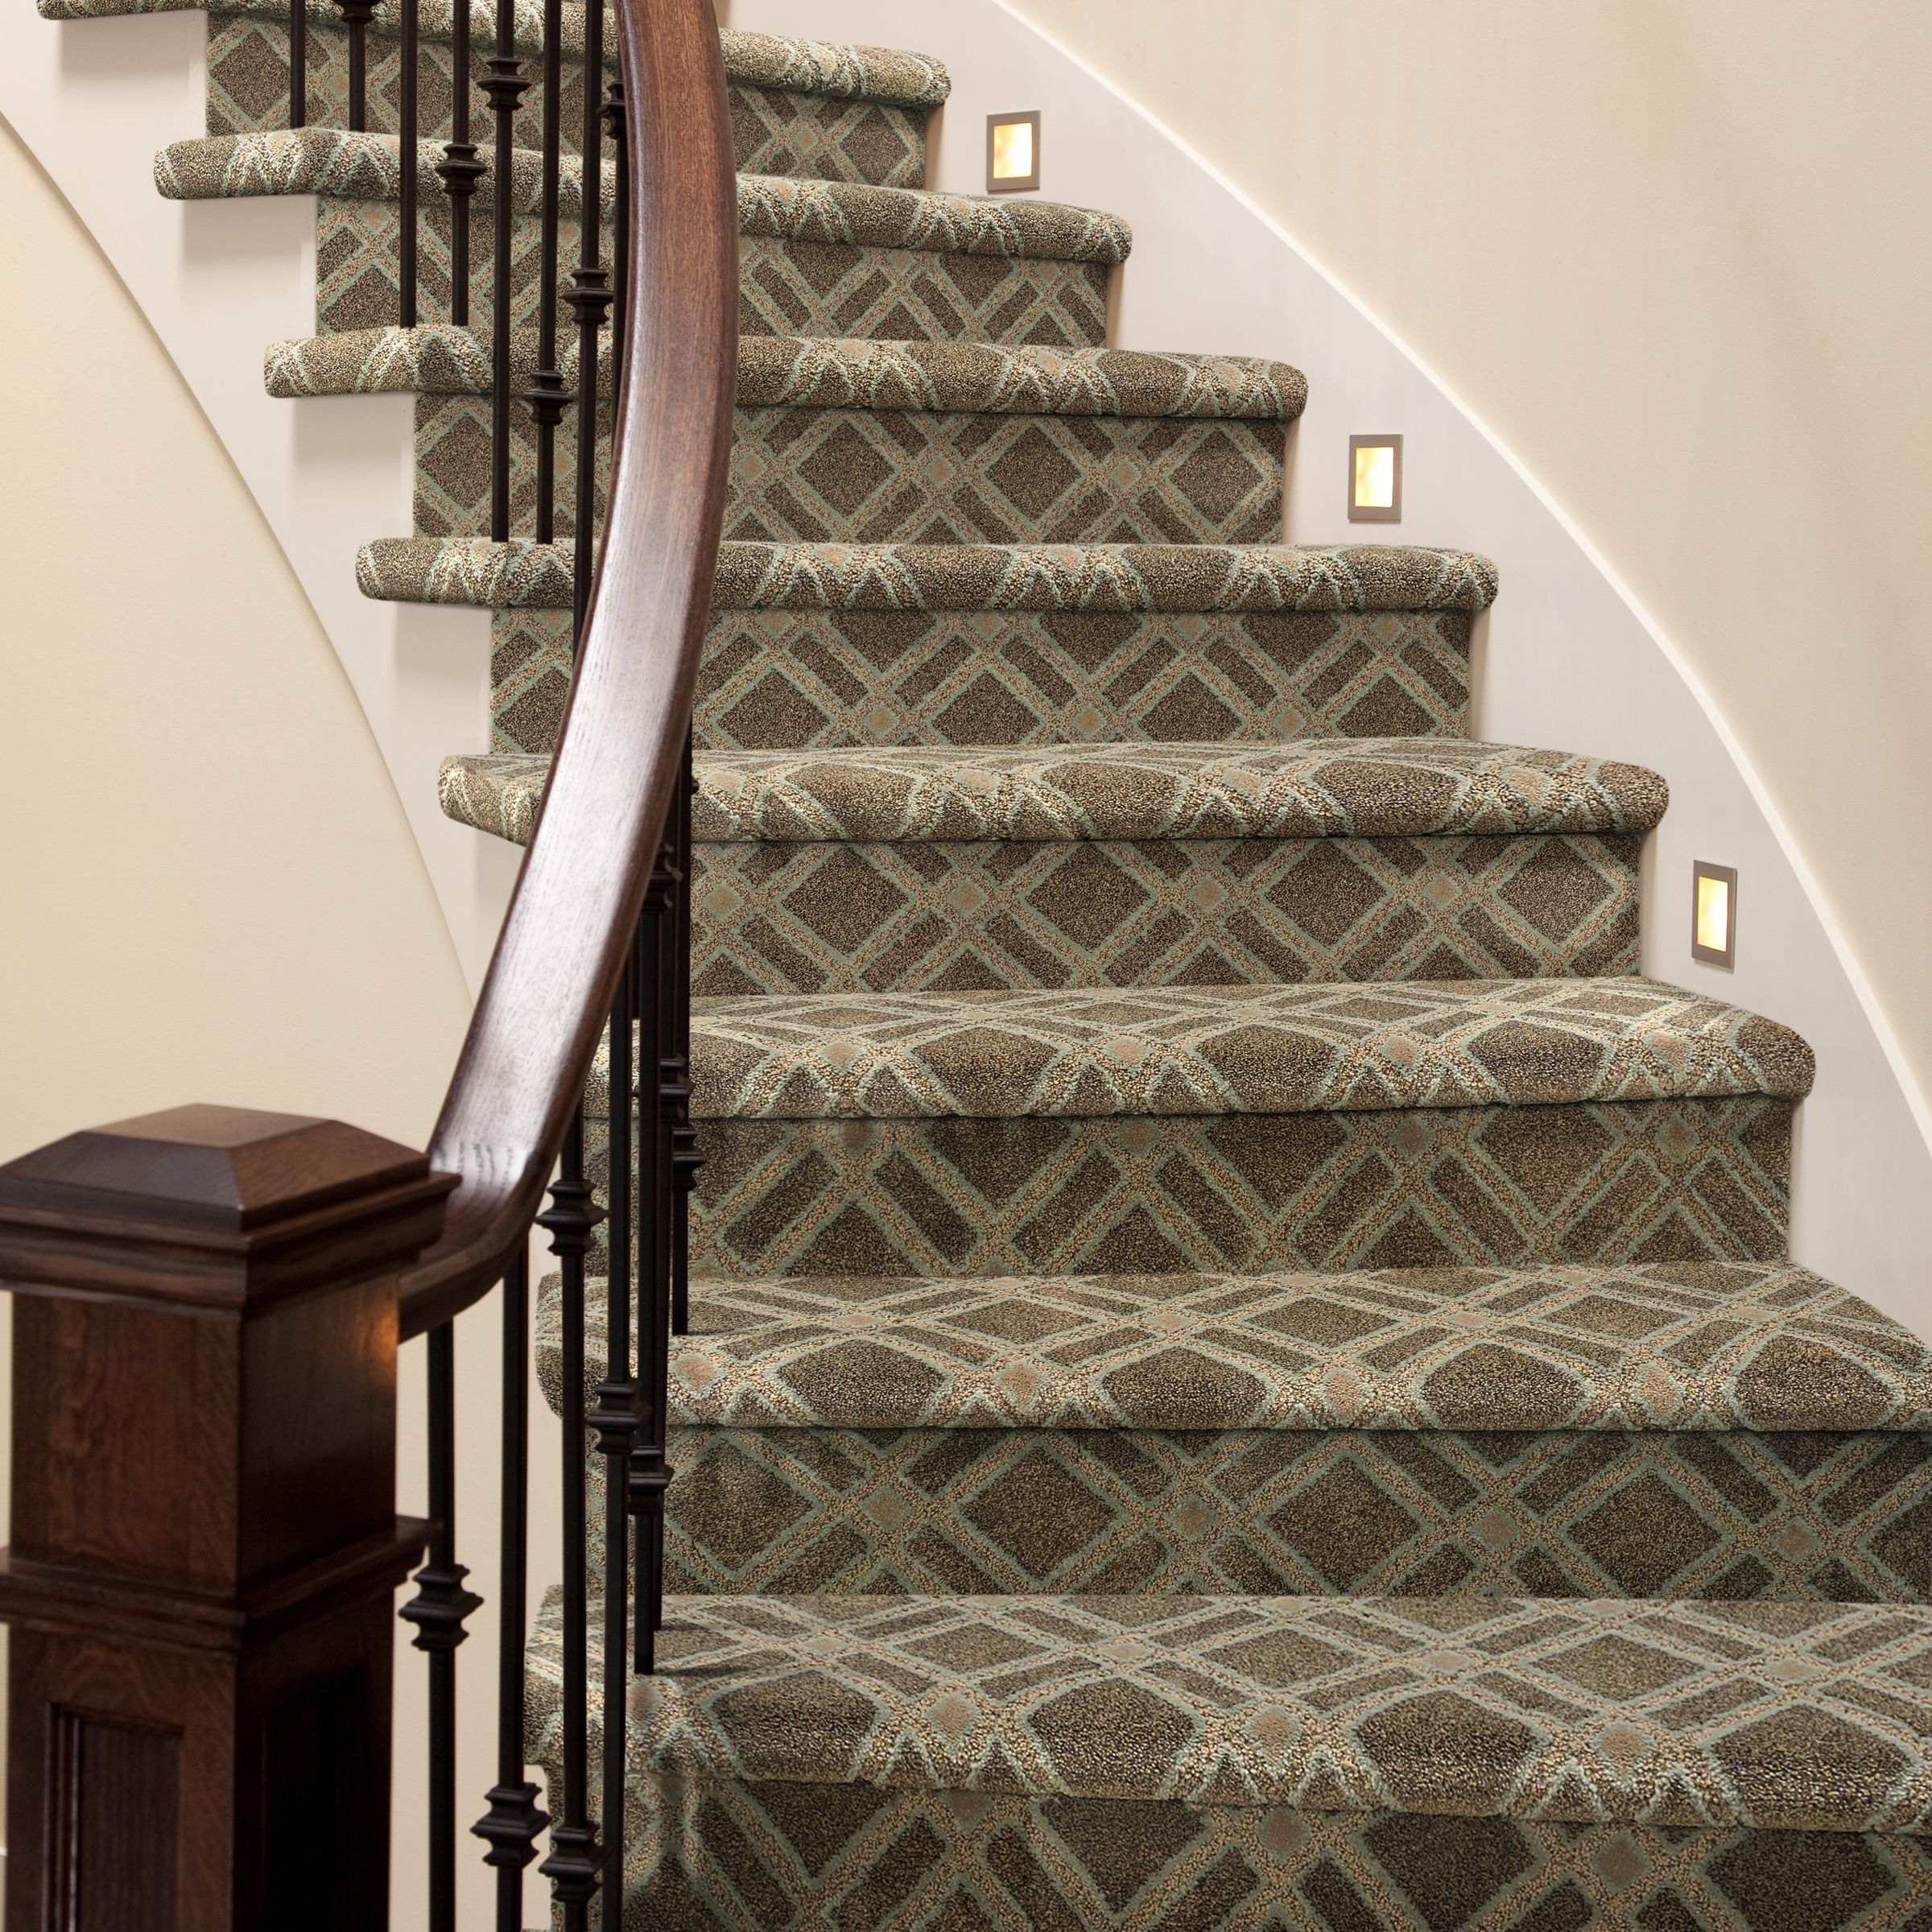 Floor Covering, Versailles, Fashion Sale, Fall Fashion, Villa, Stairways,  Pavilion, Carpets, Ivory